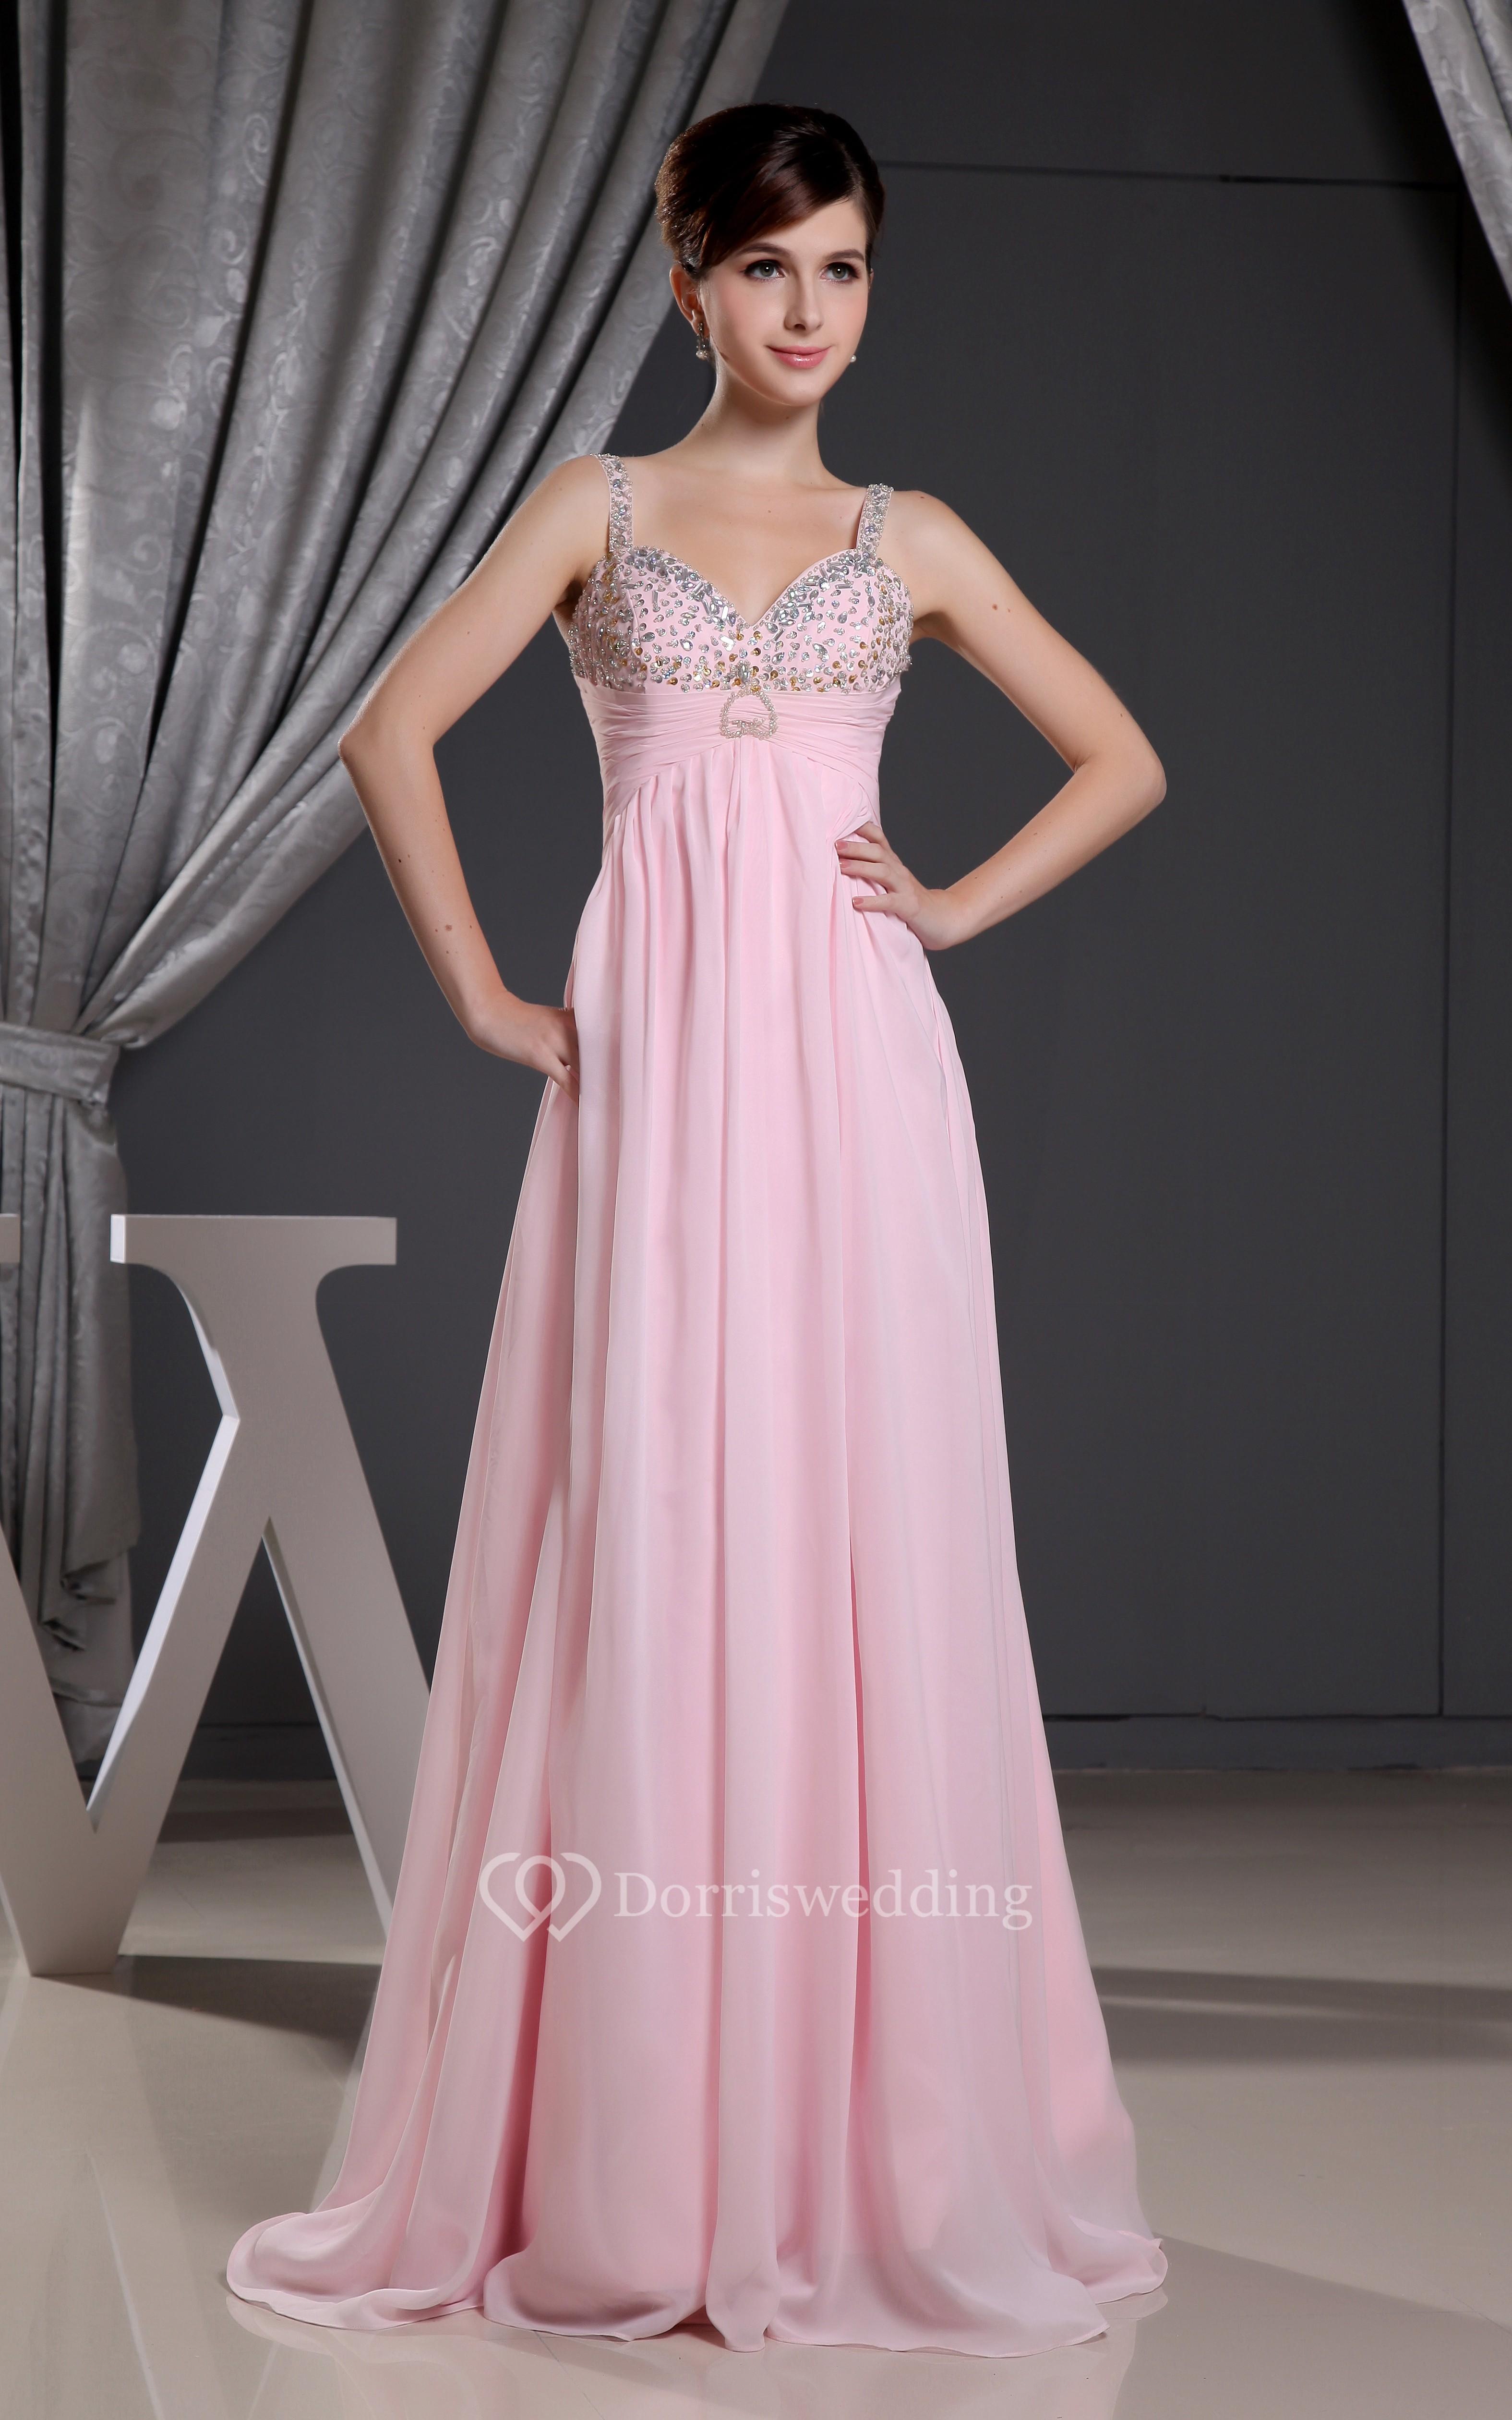 Sleeveless Chiffon Maxi Dress With Ruched Waist and Beading